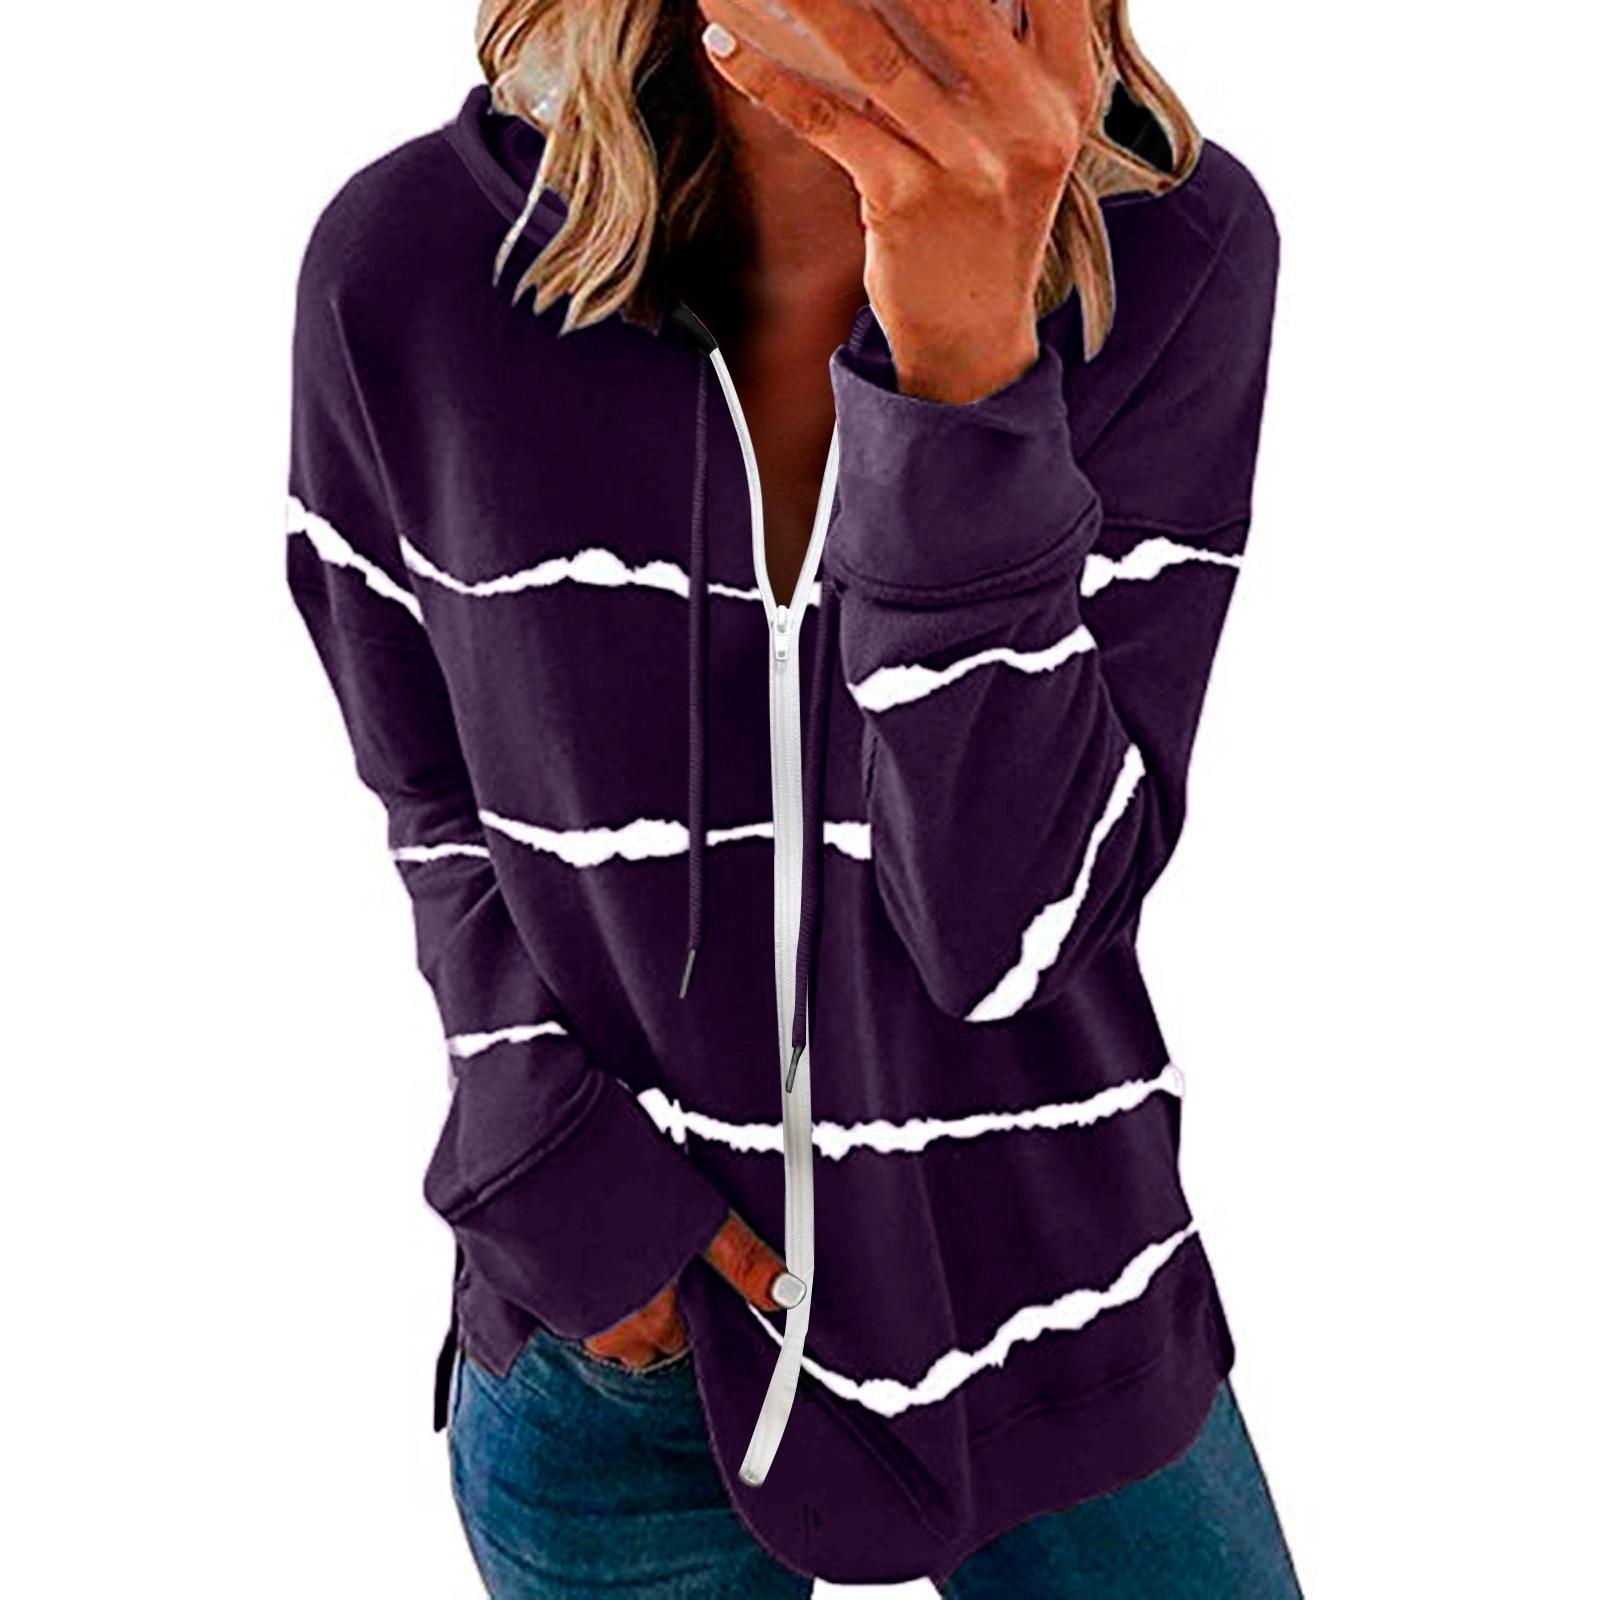 40#Womens Hoodie Striped Full Zipper Long Sleeve Lightweight Sweatshirts Spring Elegant Pullover Tee Tops толстовка женская 9